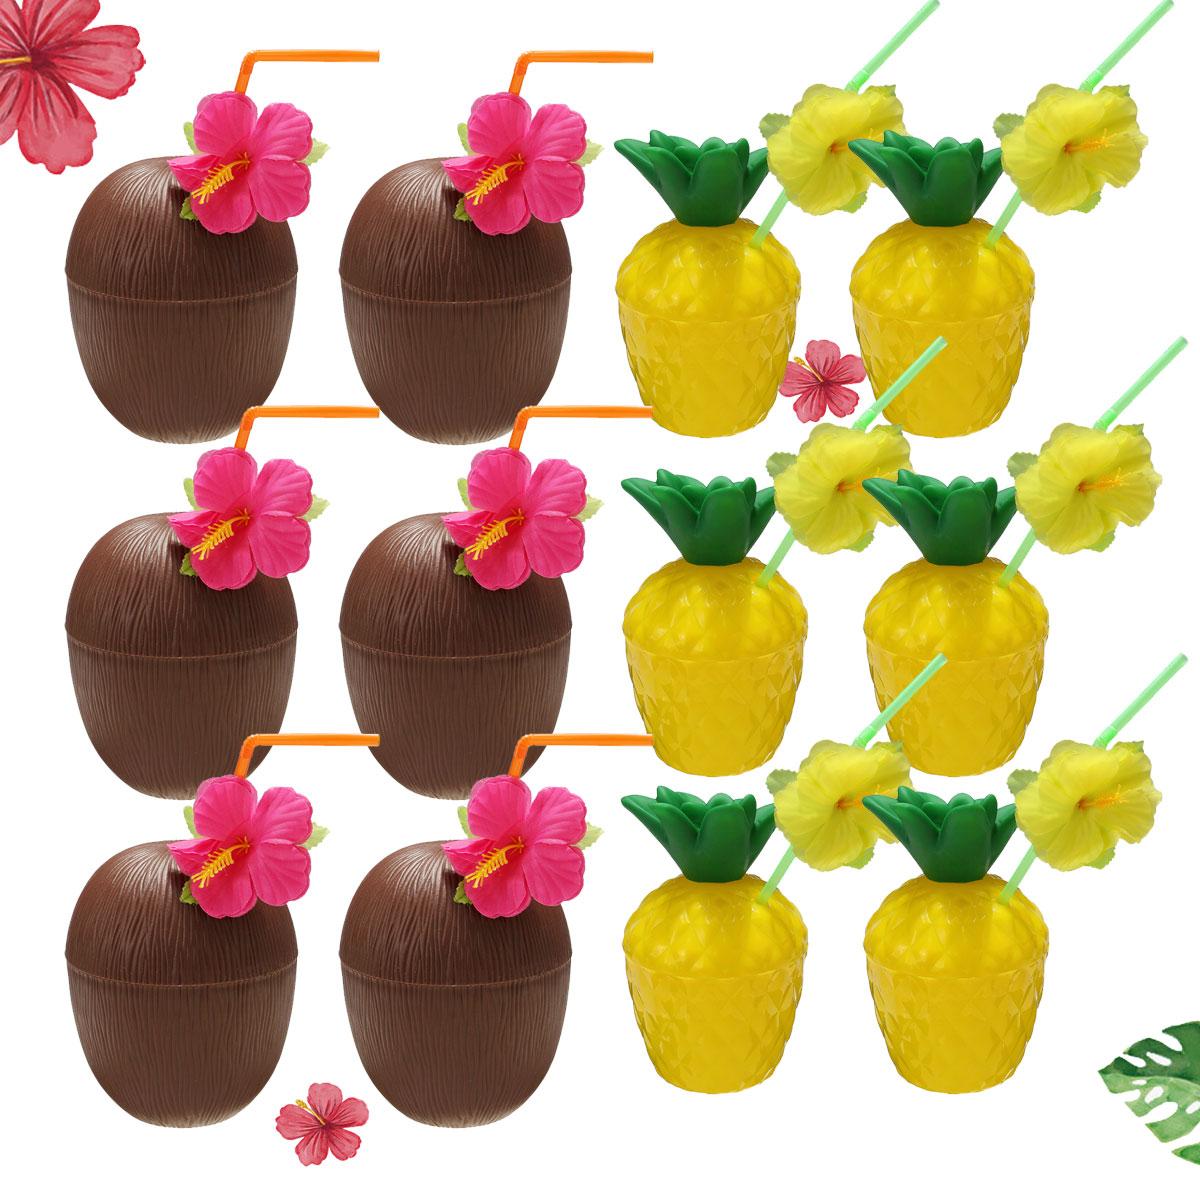 12Pcs Plastic Coconut Pineapple Cup w/ Straw Tropical Hawaiian Luau Hula Beach Pool Party Cup Decor